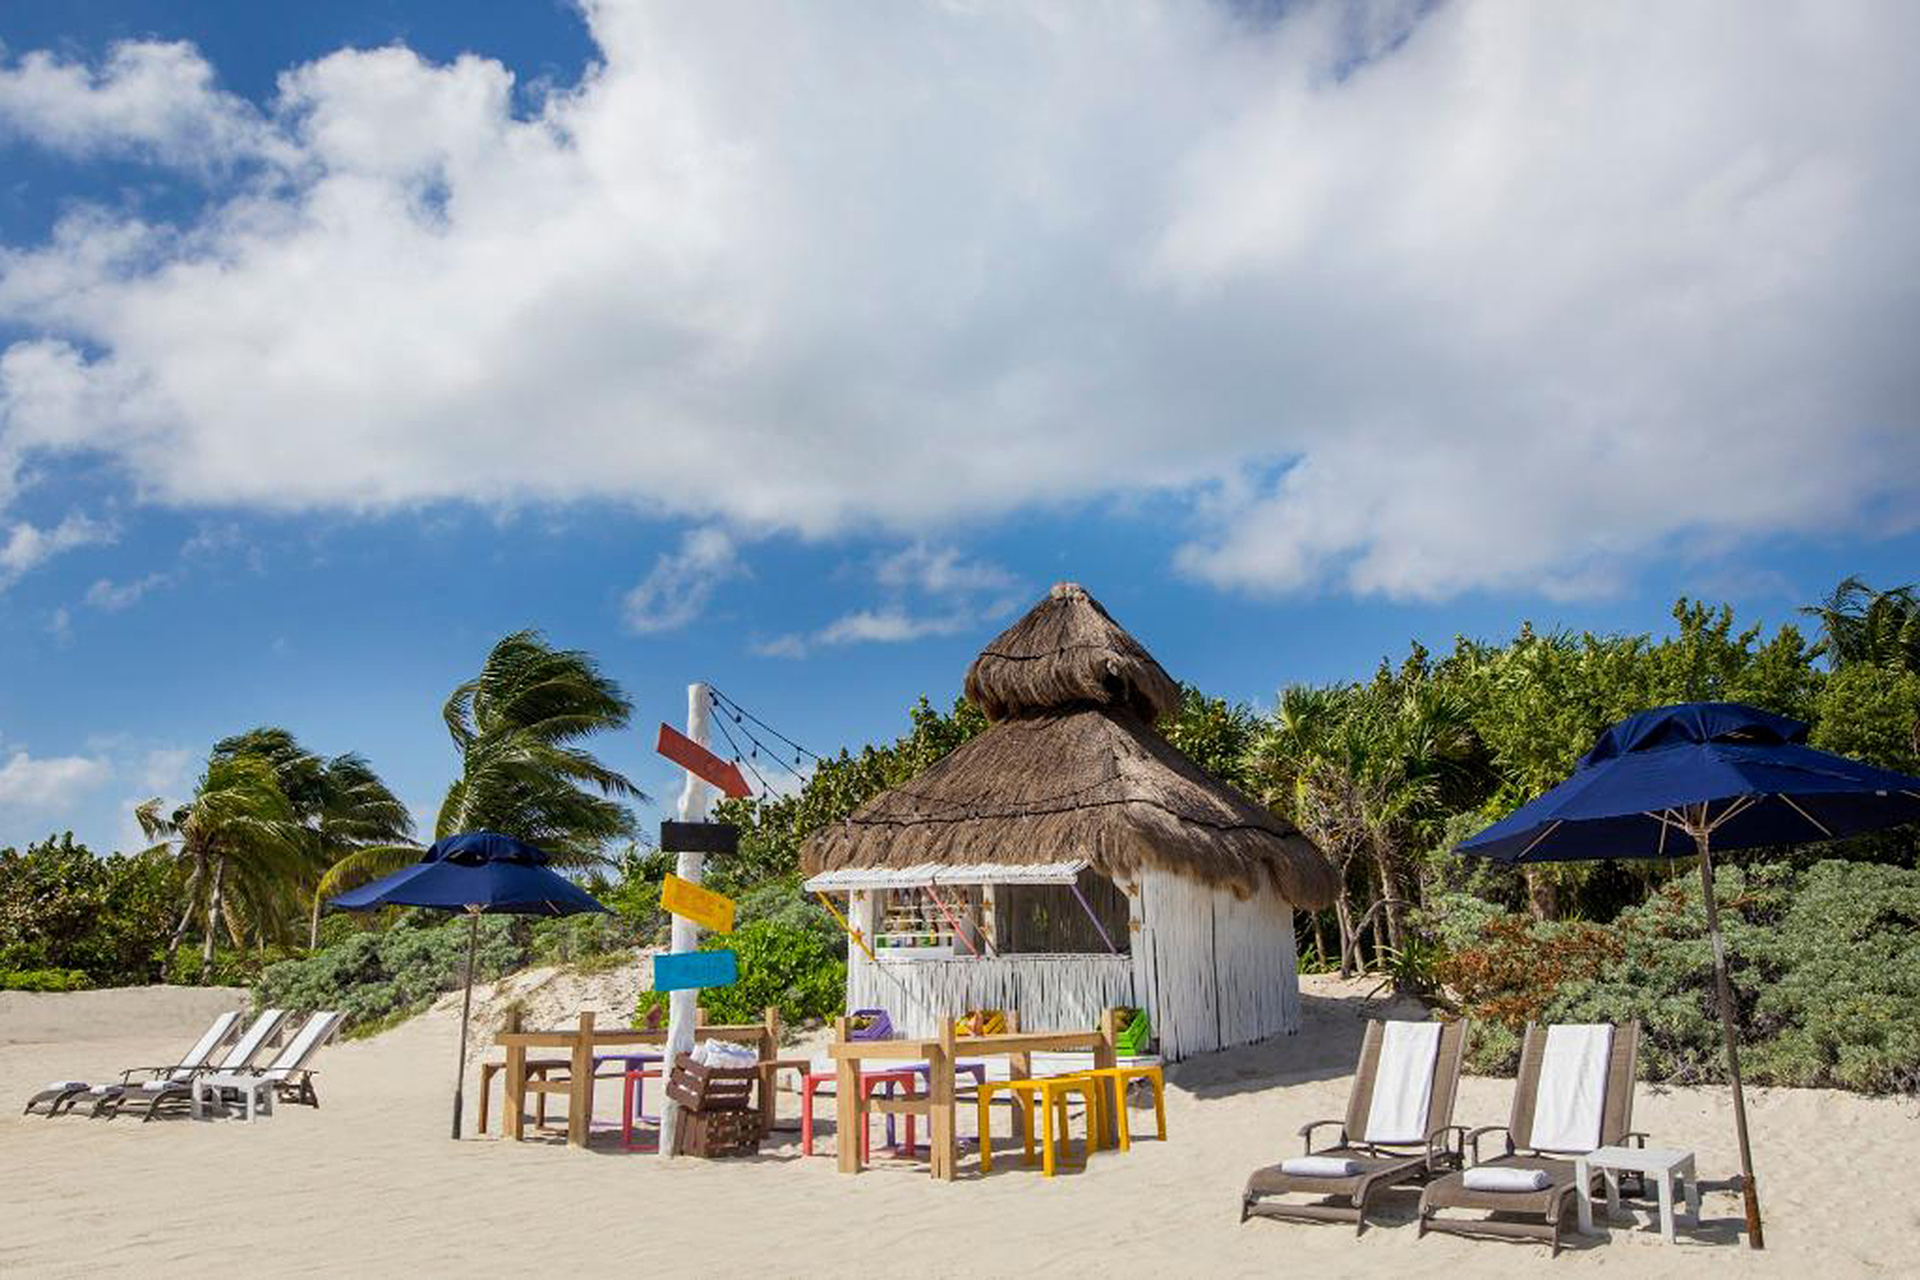 Banyan Tre Mayakoba, hut on the beach with umbrellas and beach chairs